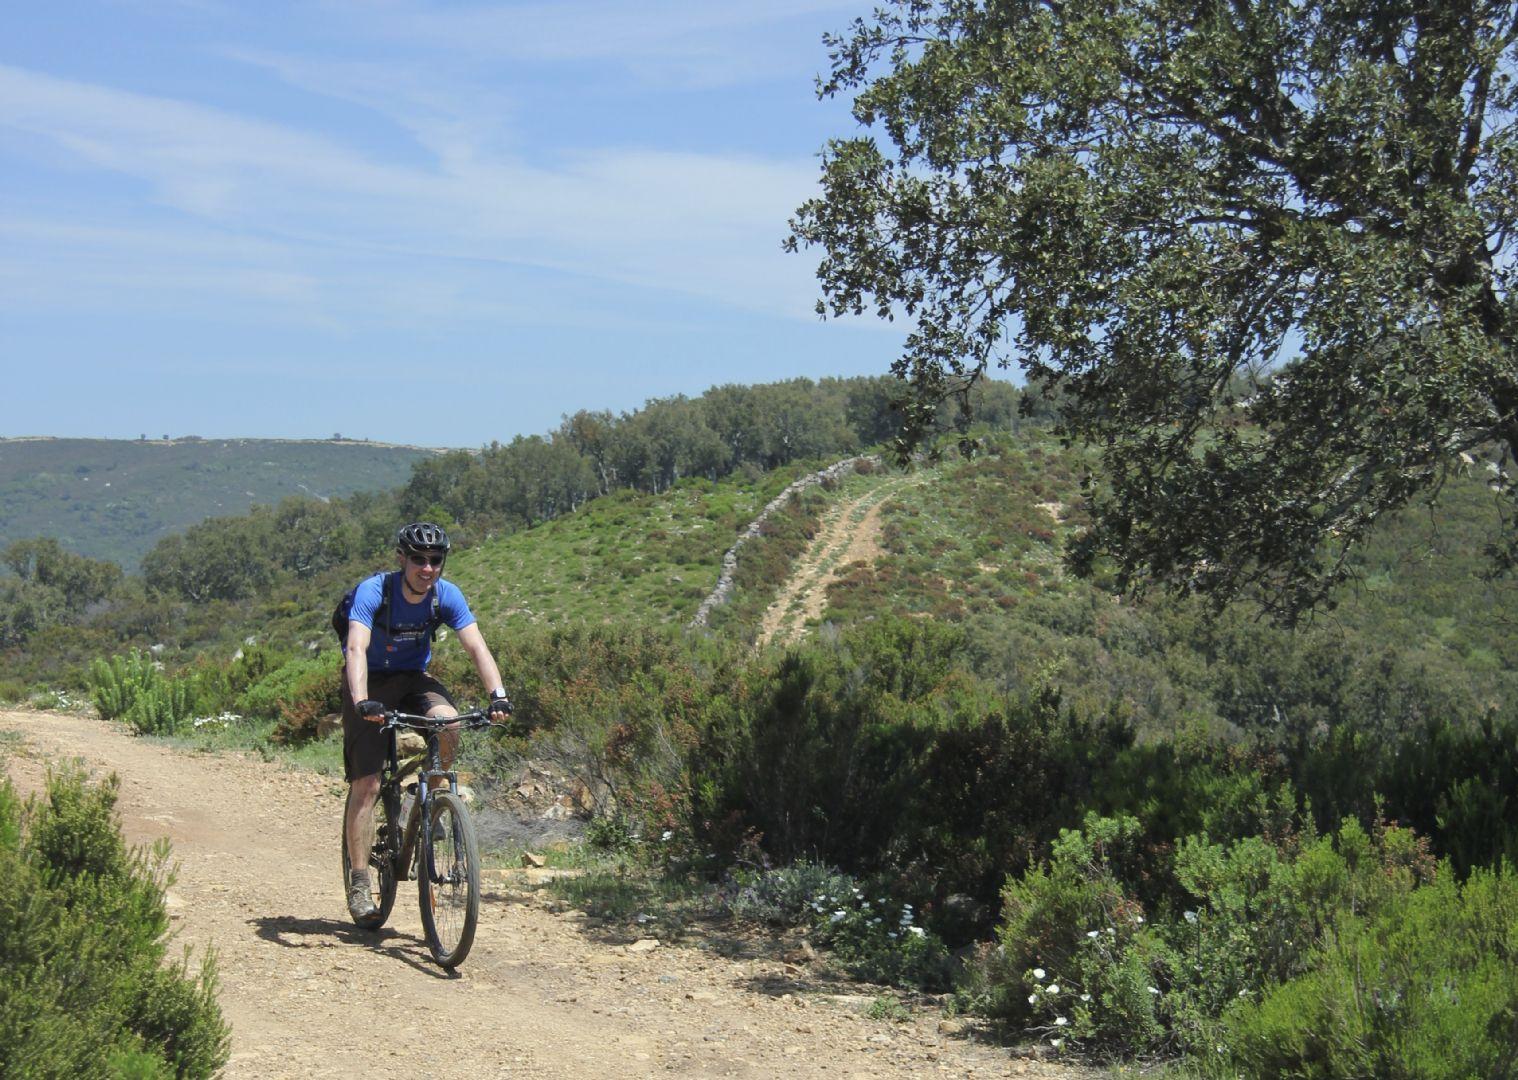 mountainbikingspain5.jpg - Spain - Ruta de la Plata - Guided Mountain Bike Holiday - Mountain Biking